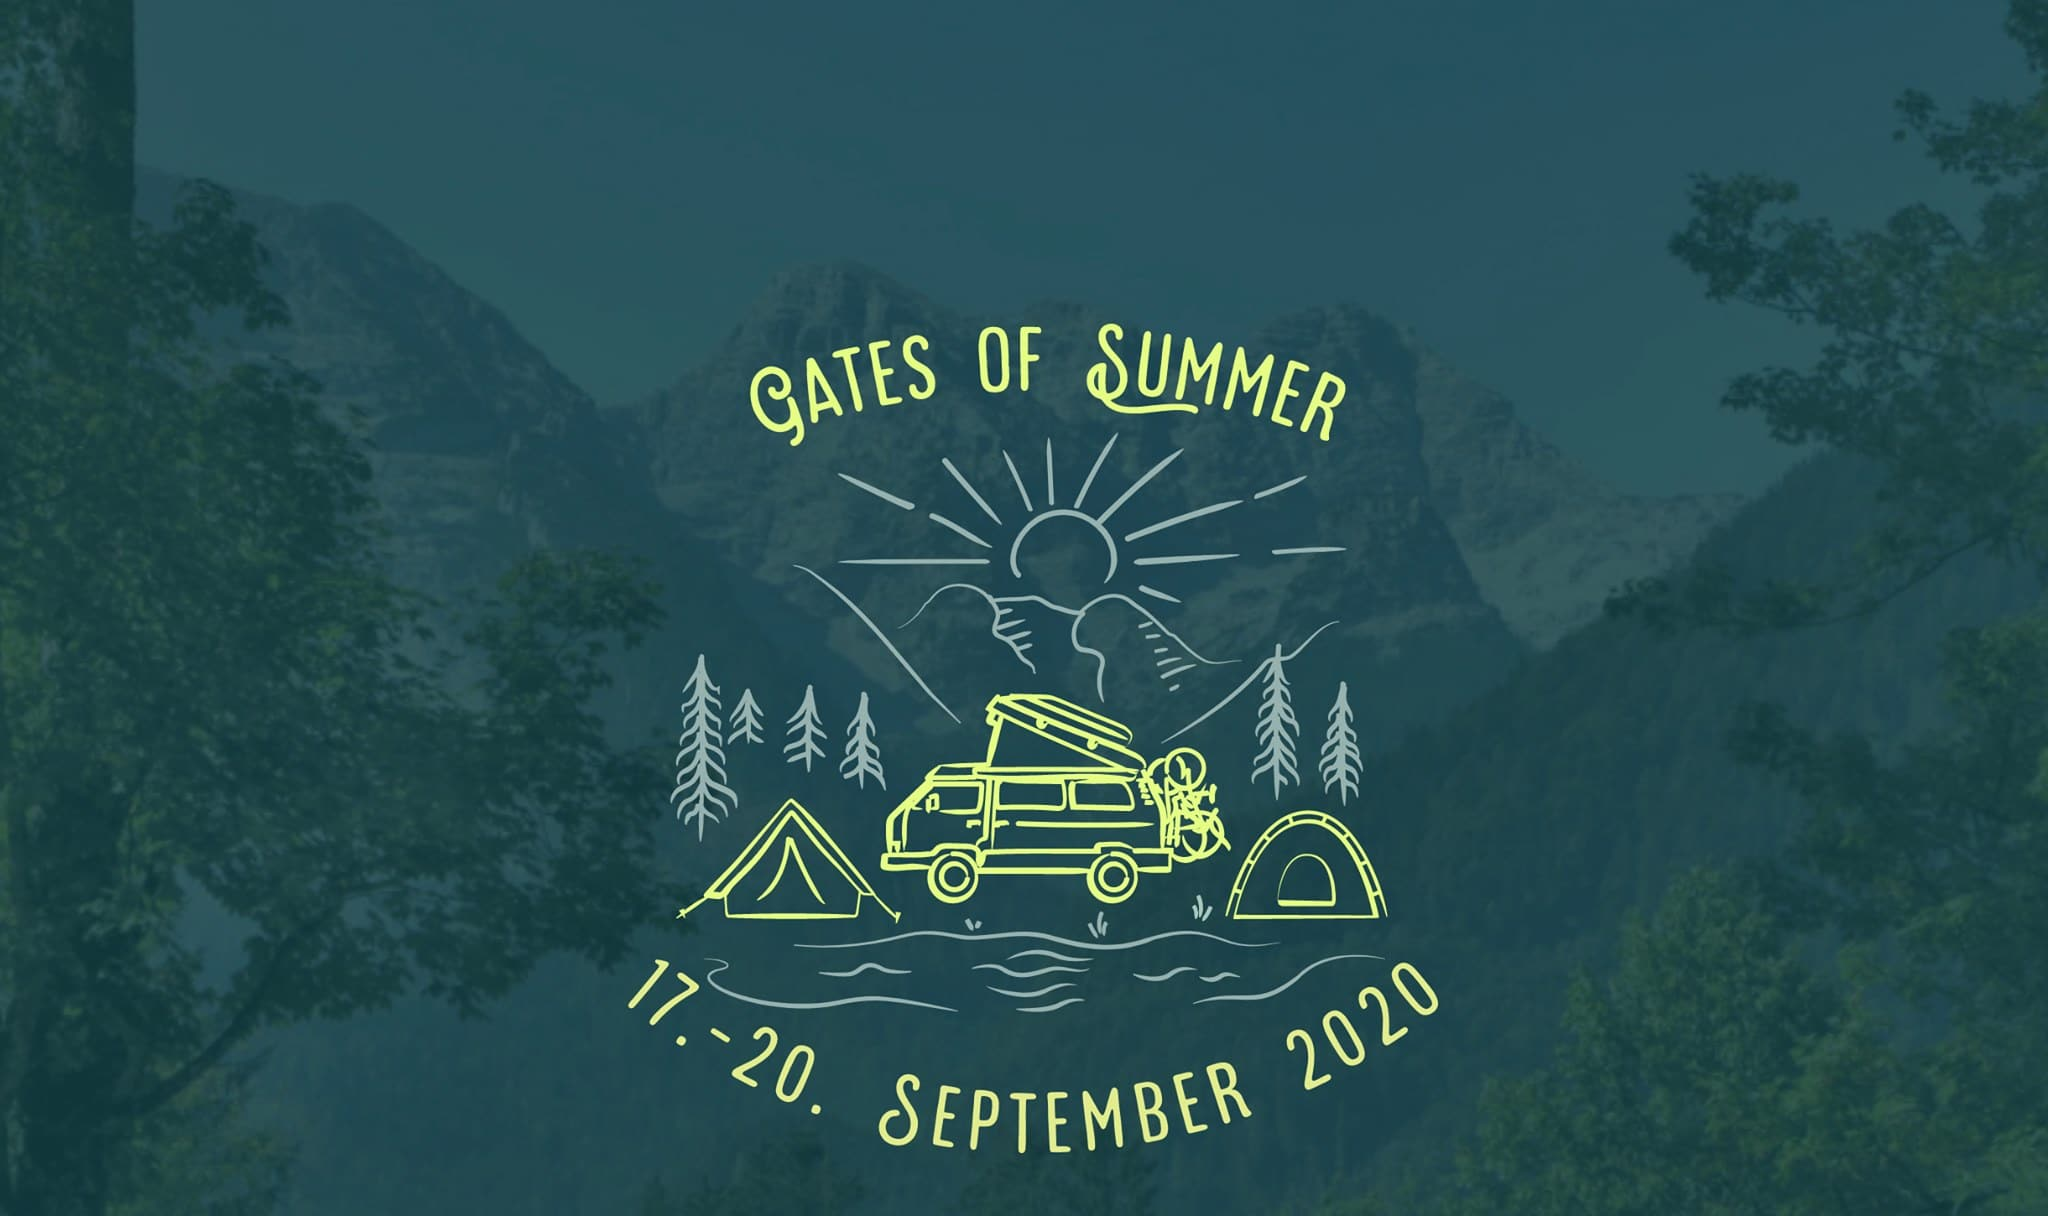 Gates of Summer